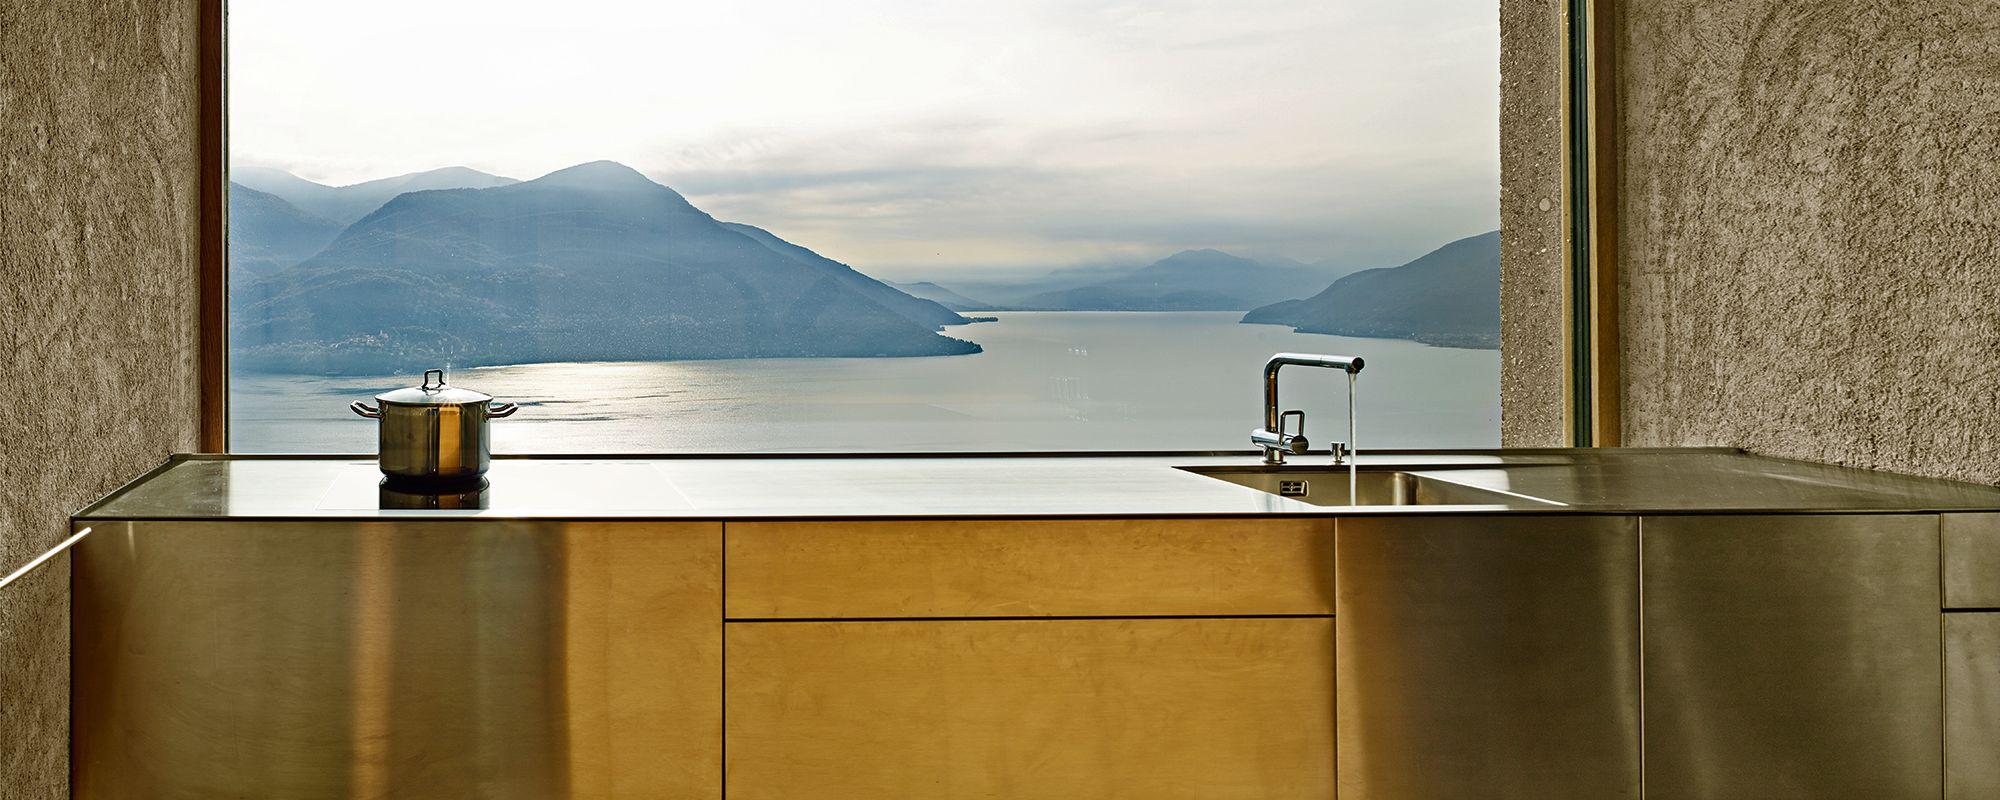 Lago Maggiore Architektur